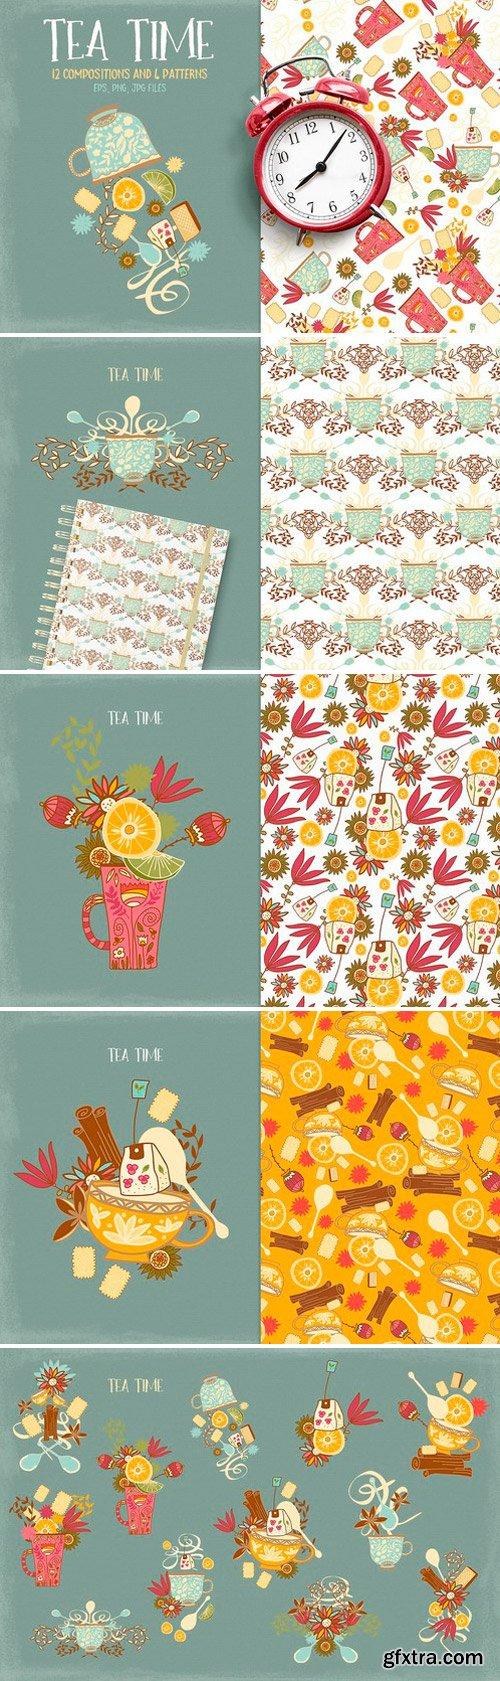 CM - Tea Time Illustrations 1078980